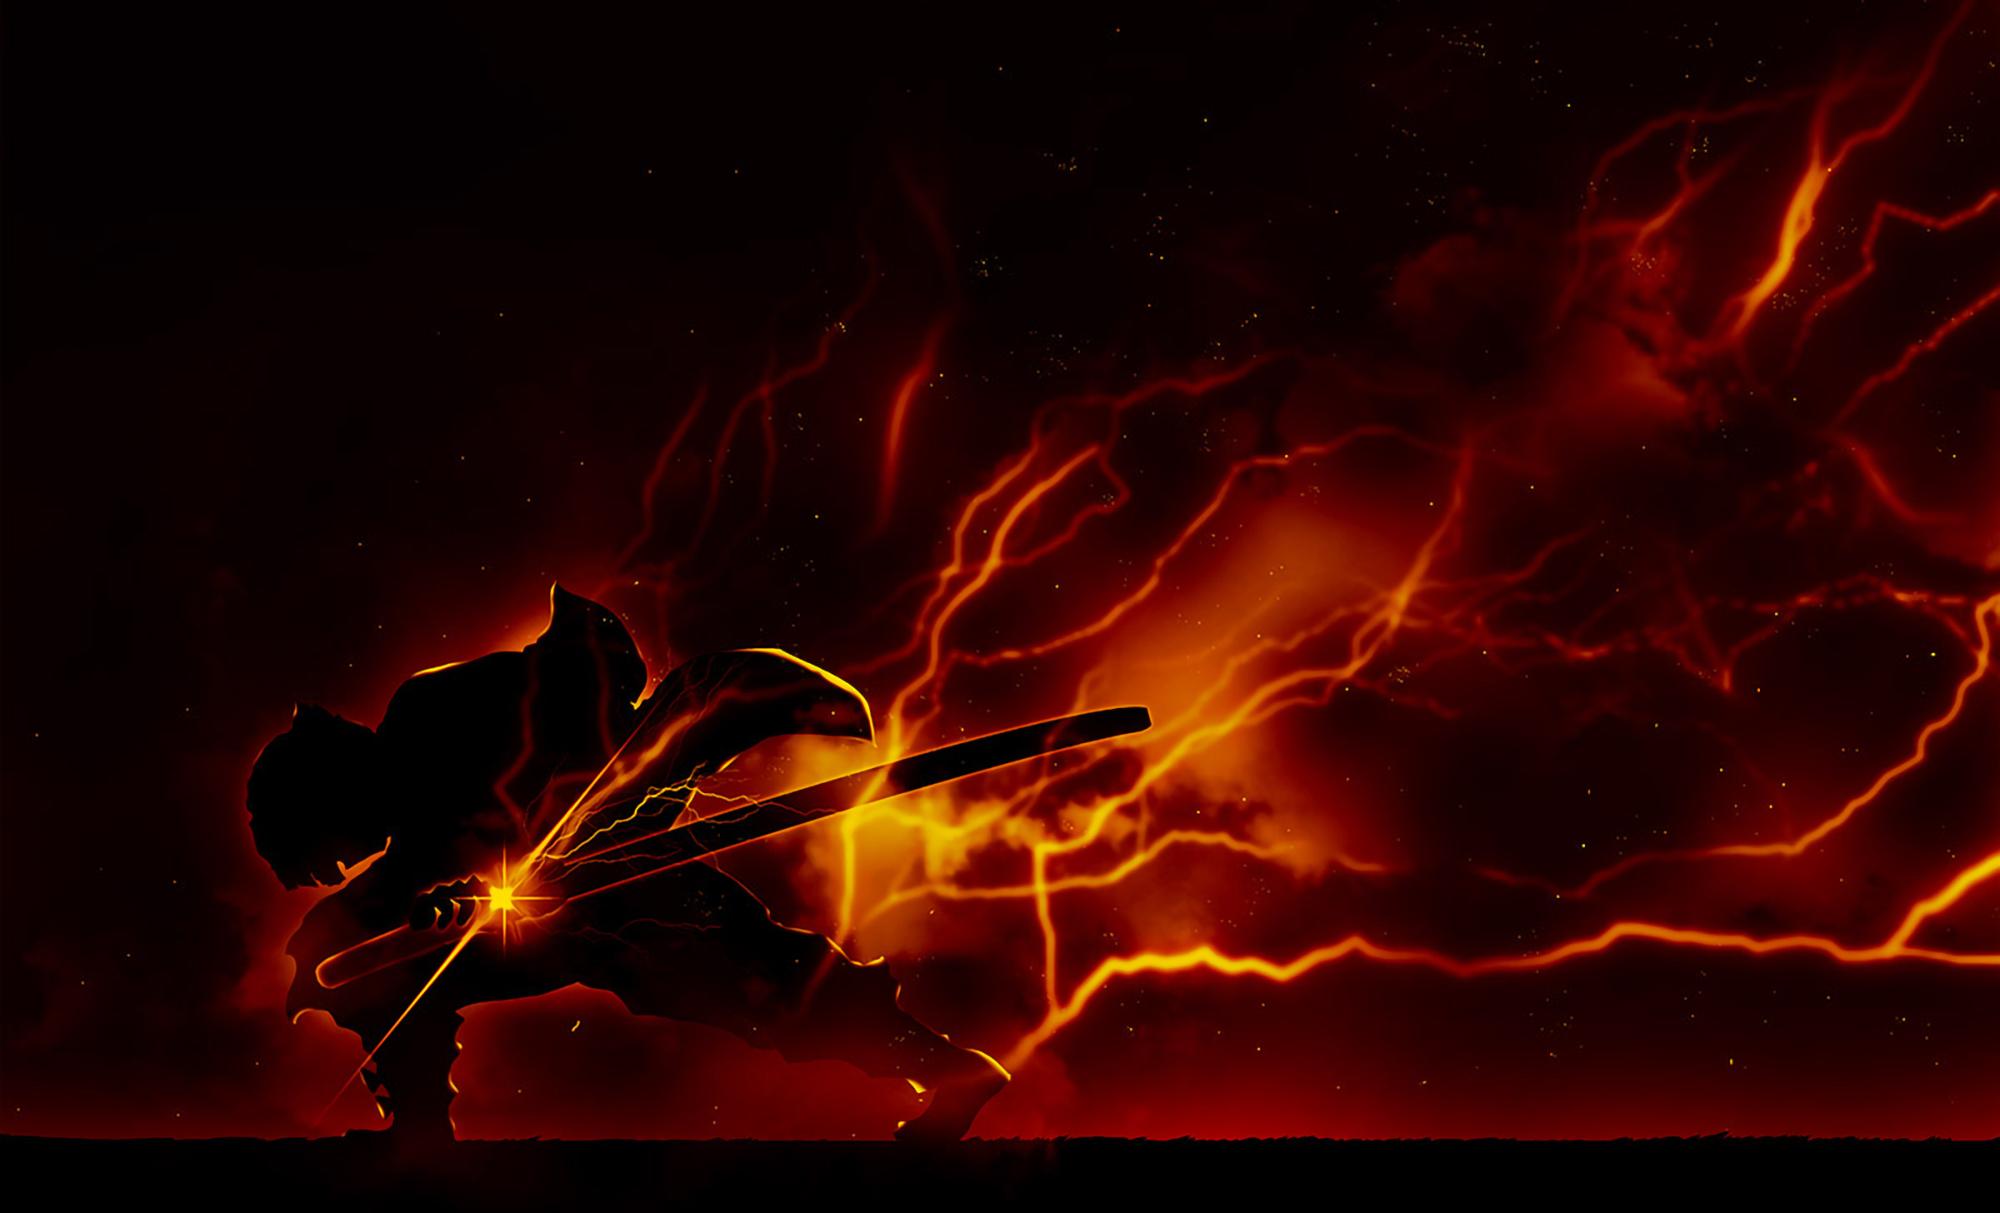 Zenitsu Agatsuma Demon Slayer Wallpaper, HD Anime 4K ...